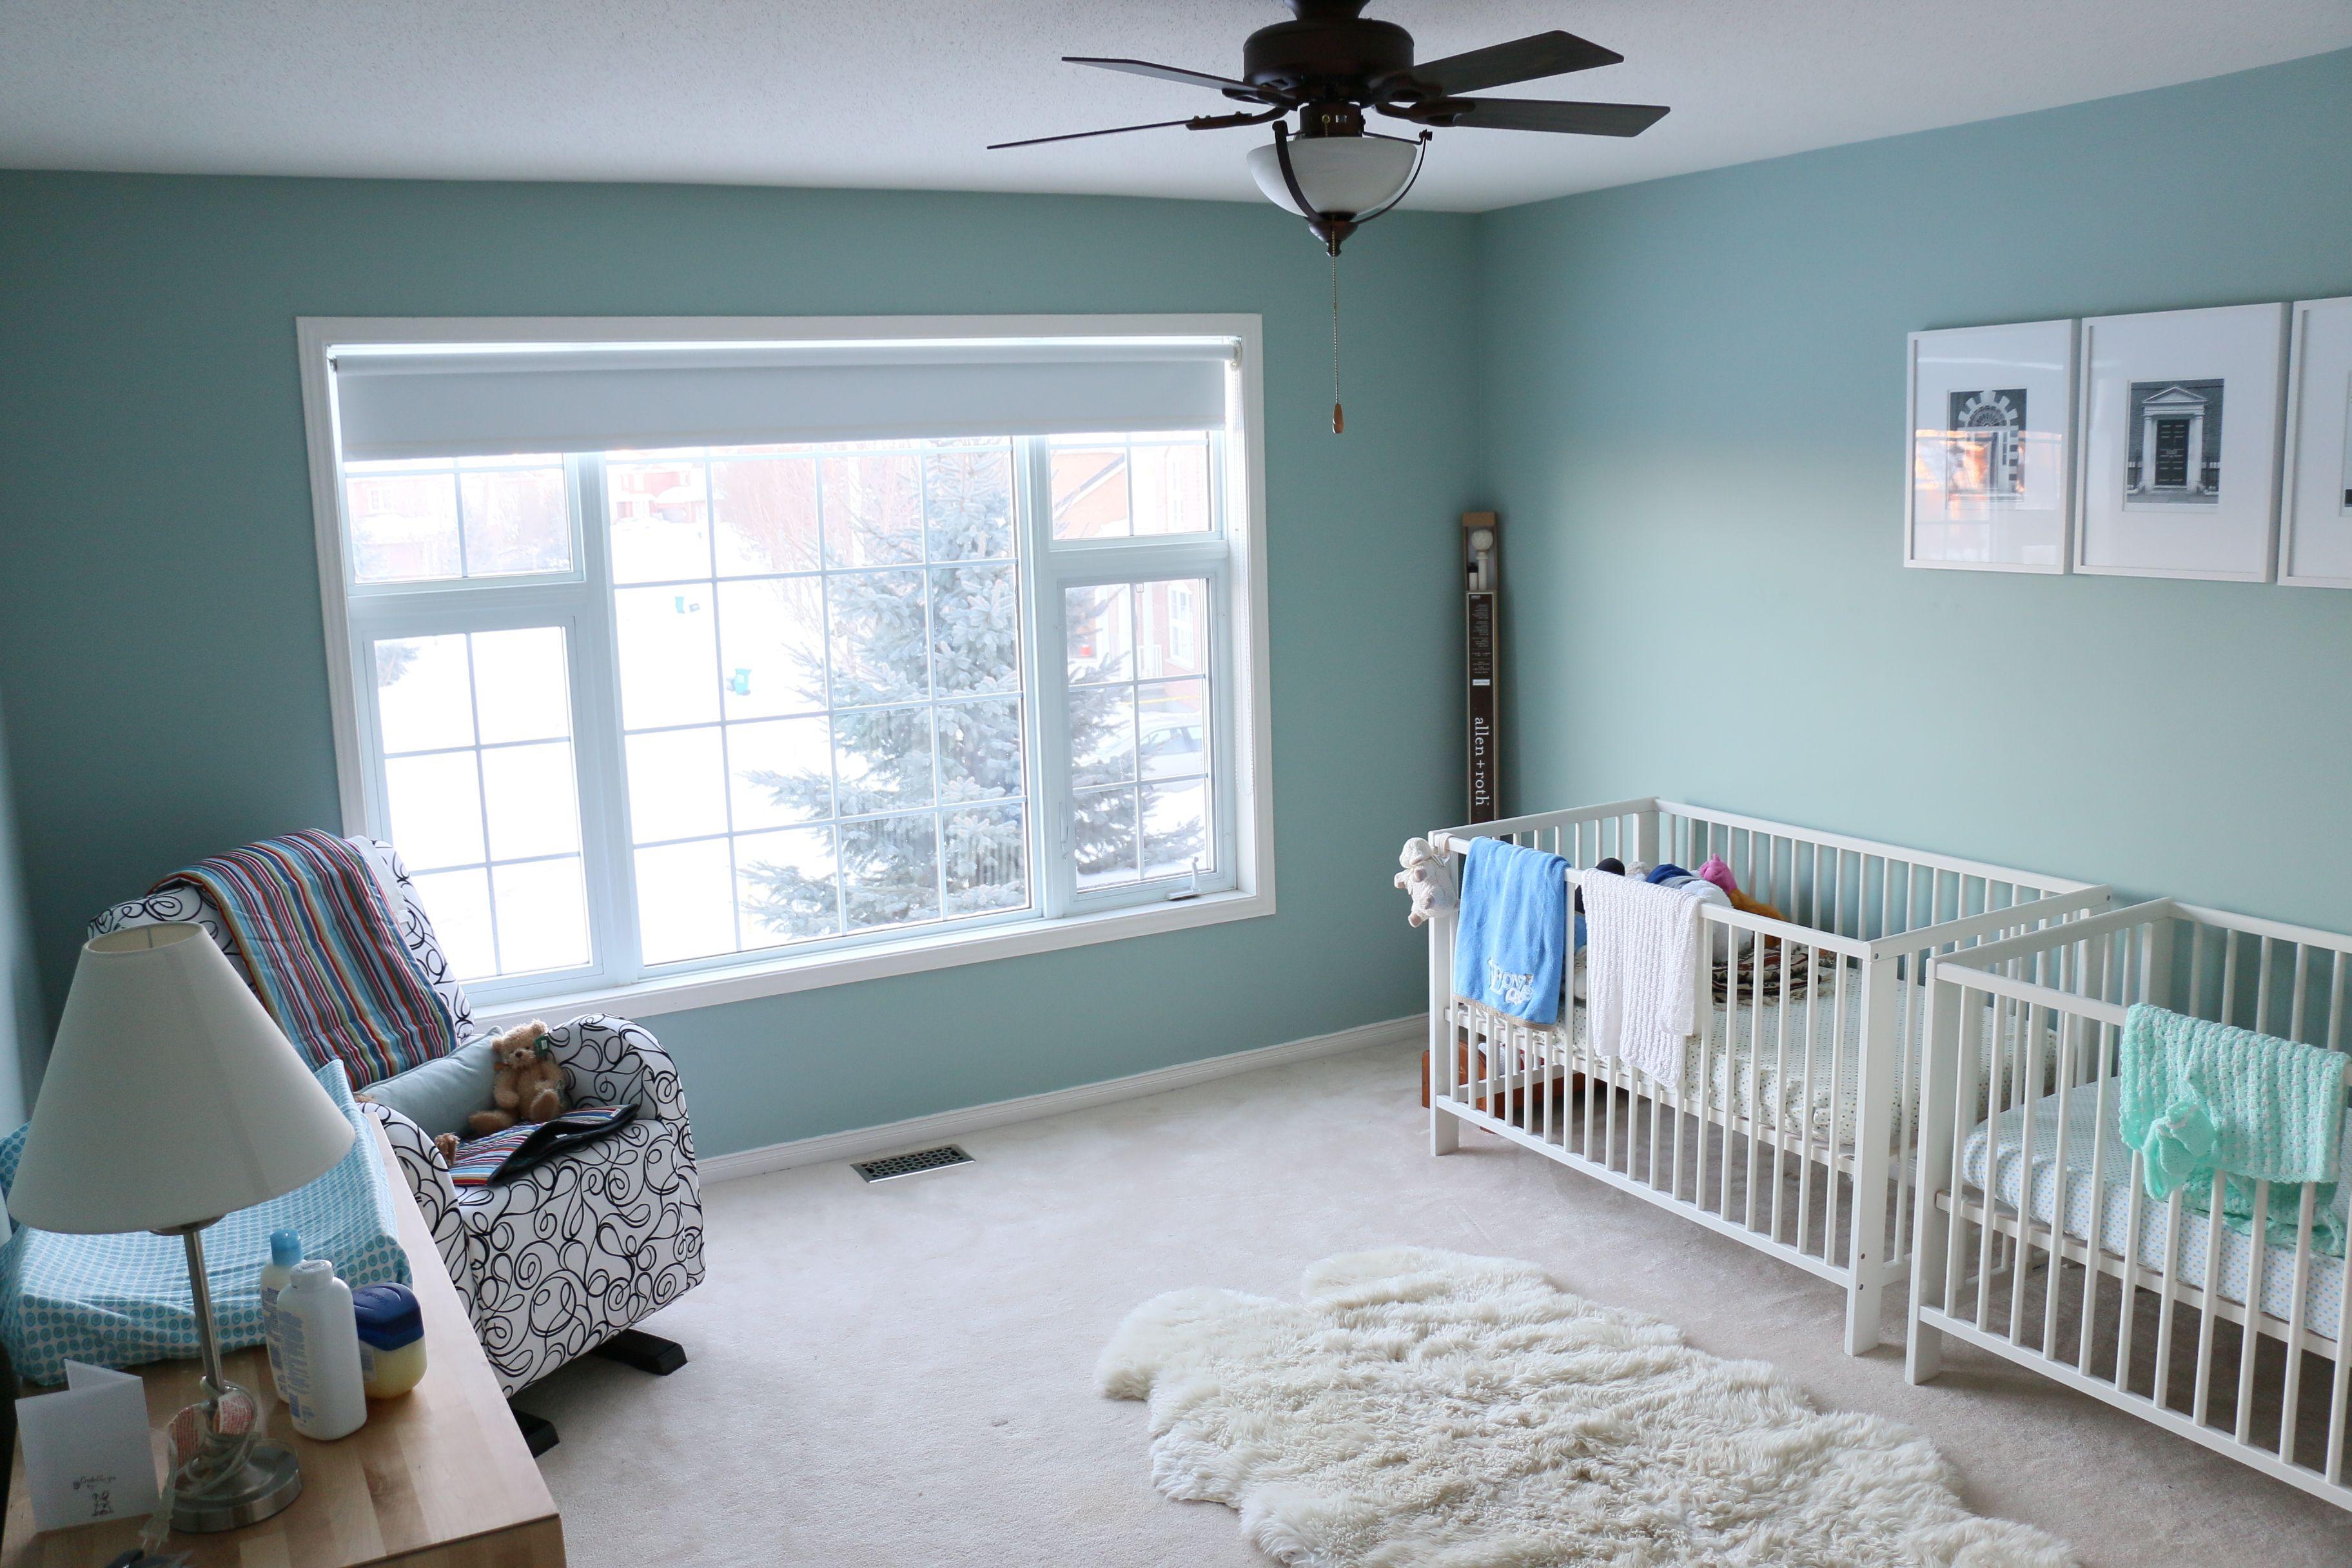 Wythe Blue Benjamin Moore Paint Ikea Gulliver Cribs